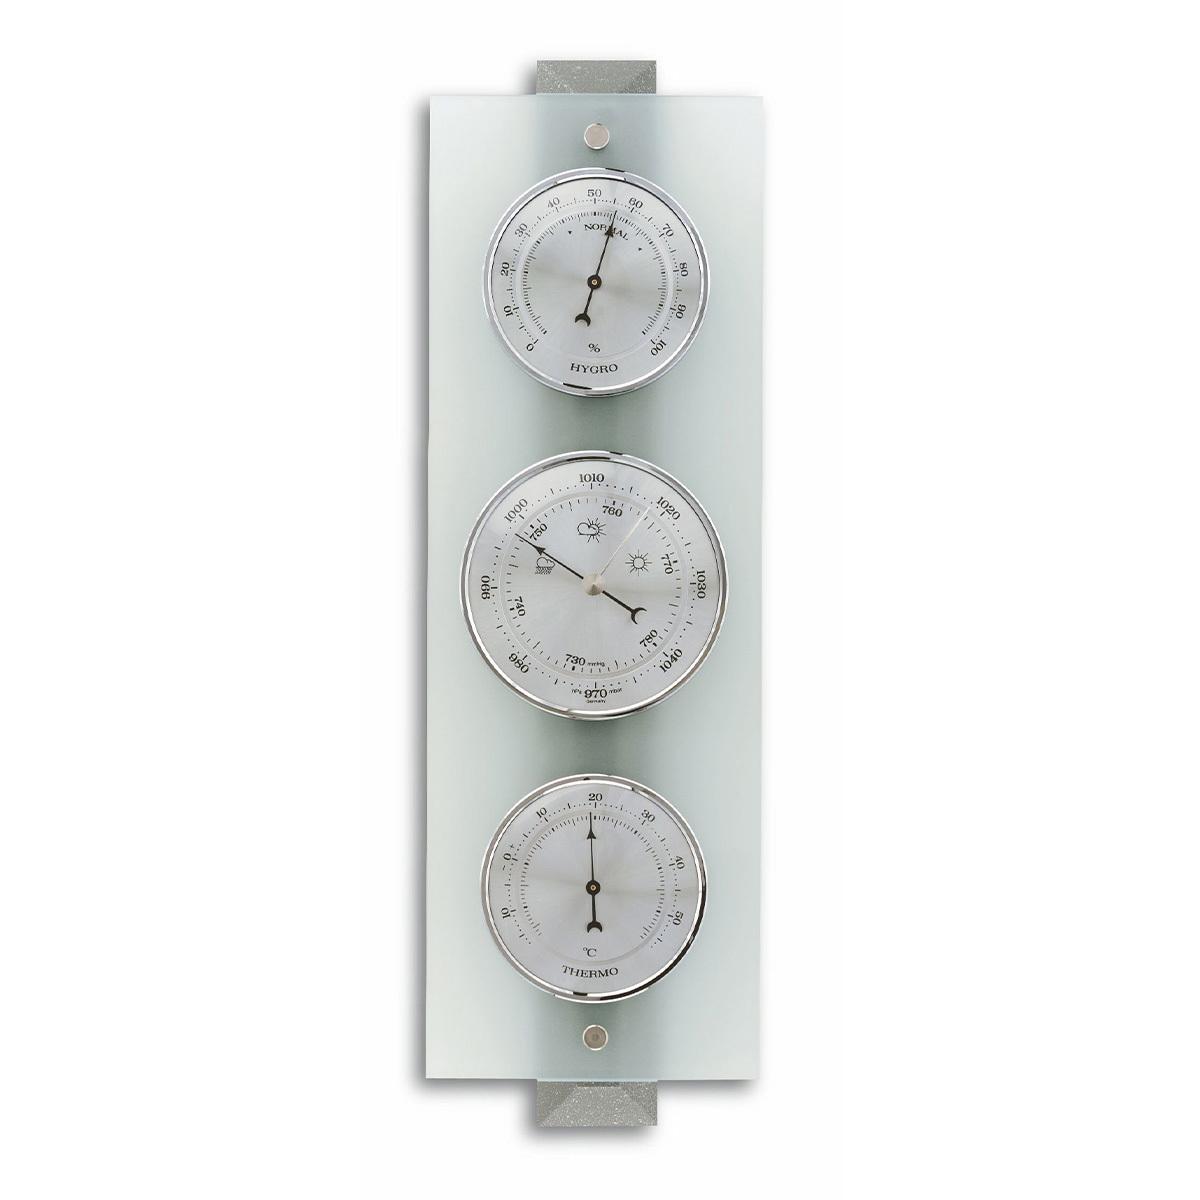 20-1067-17-analoge-wetterstation-glas-1200x1200px.jpg